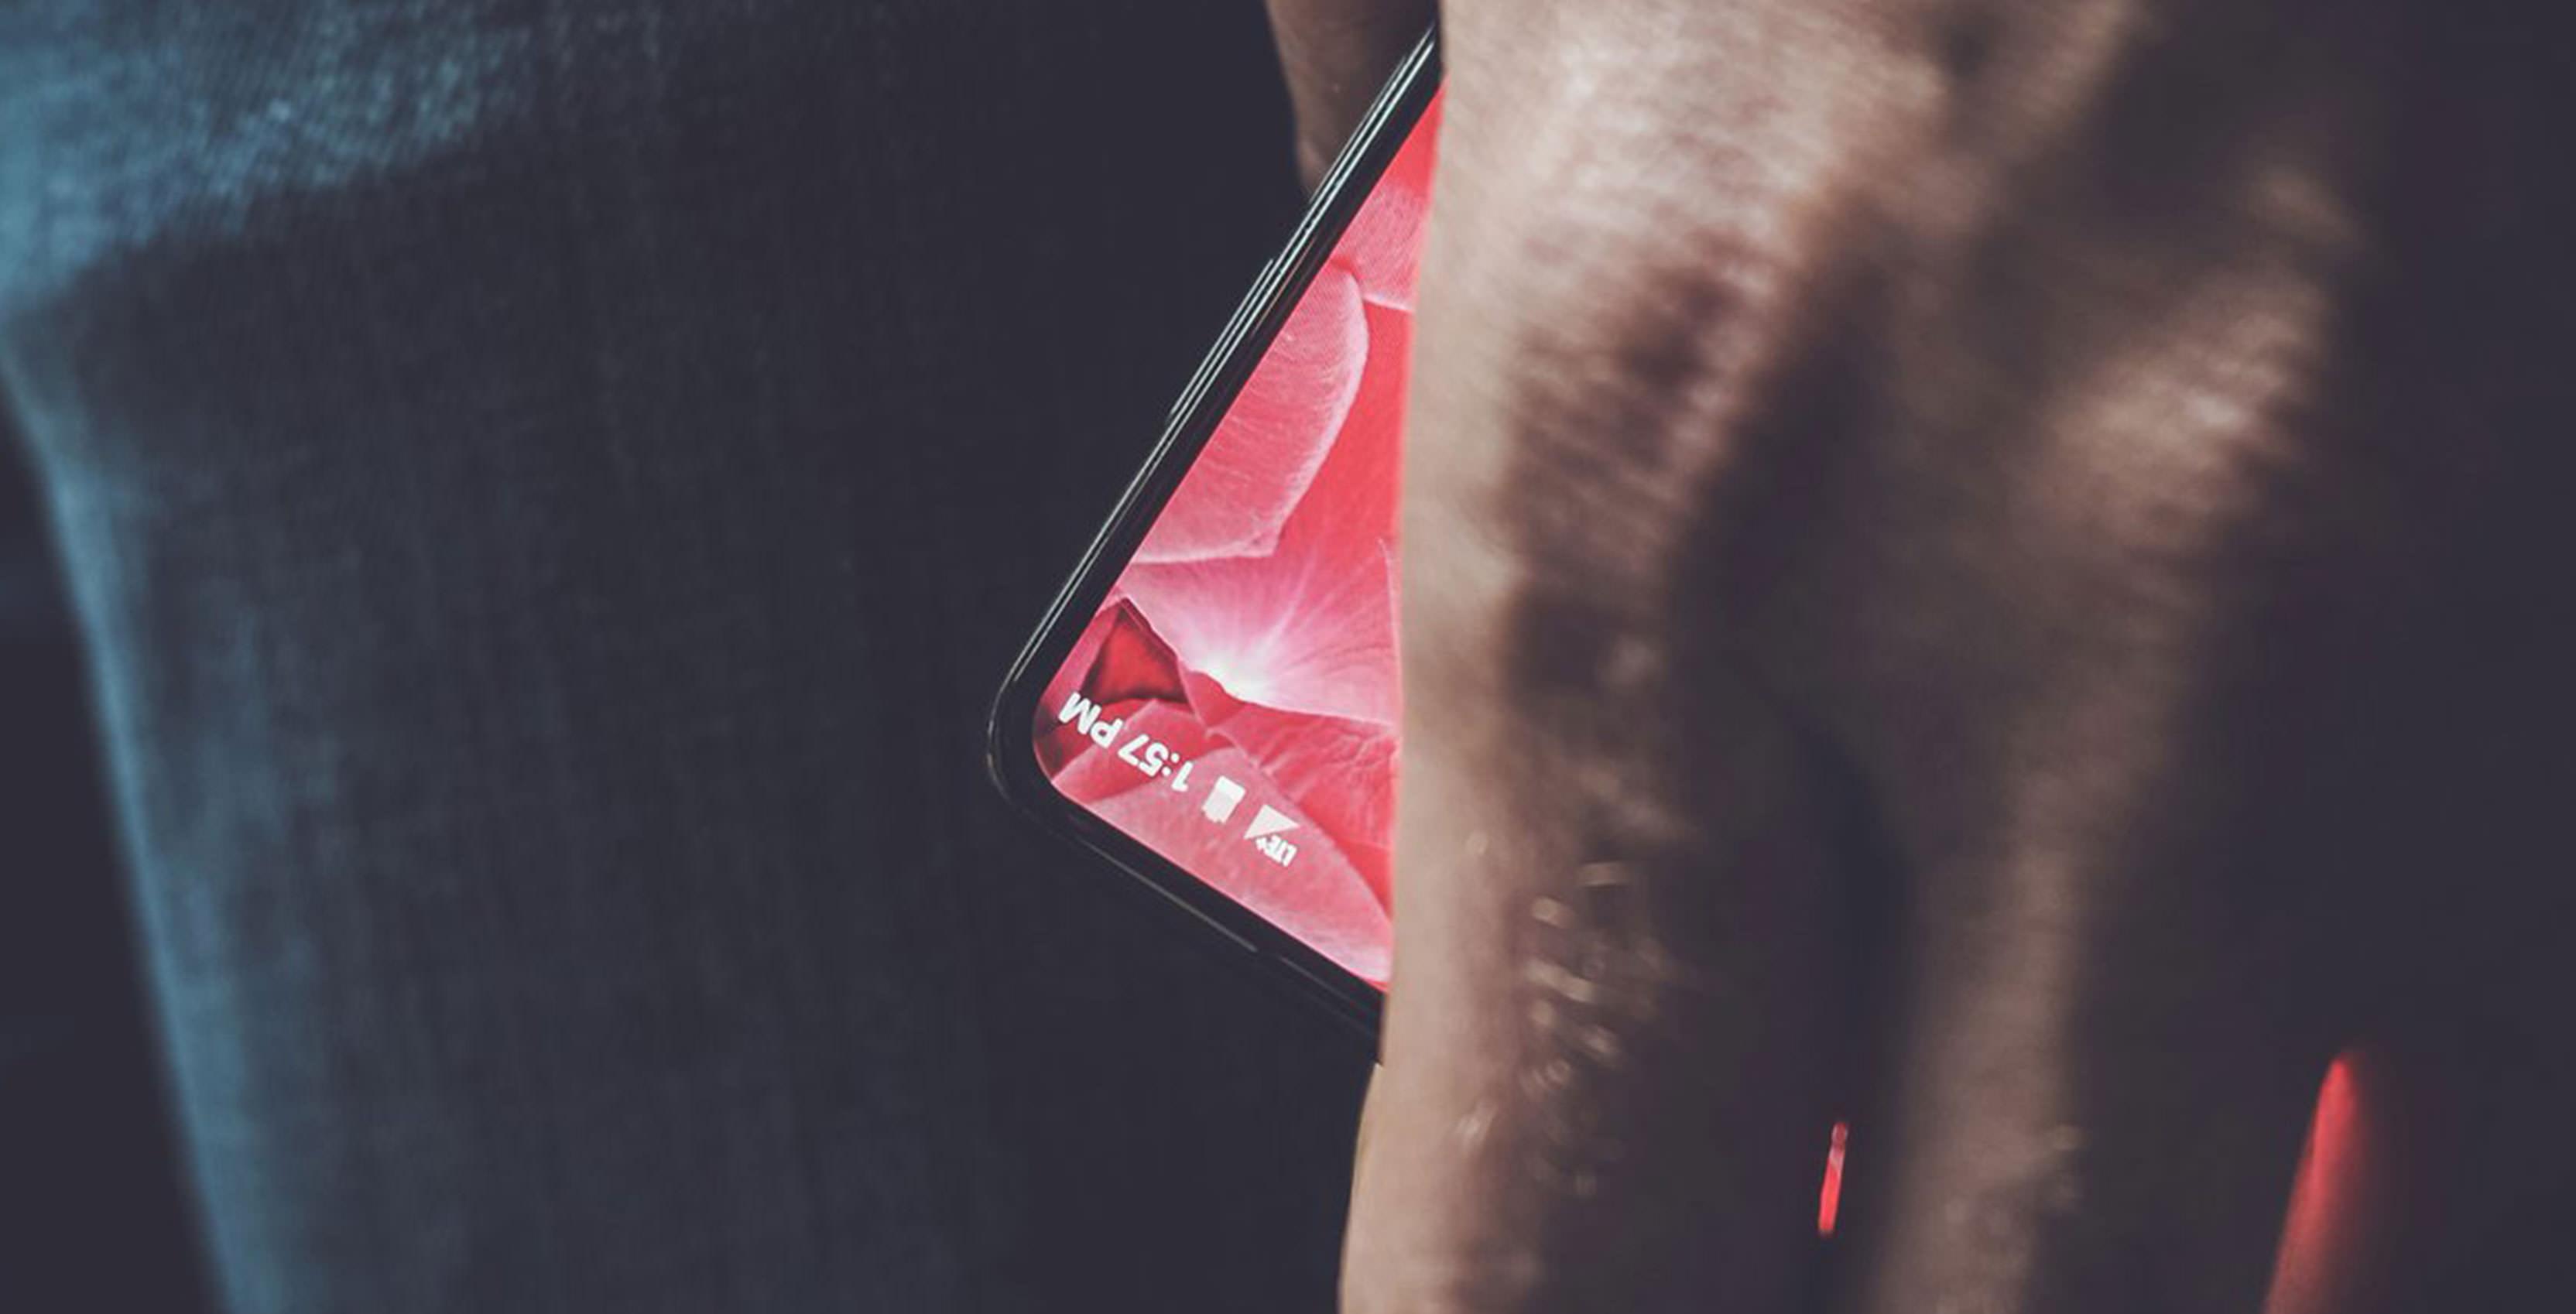 Andy Rubin's Essential smartphone